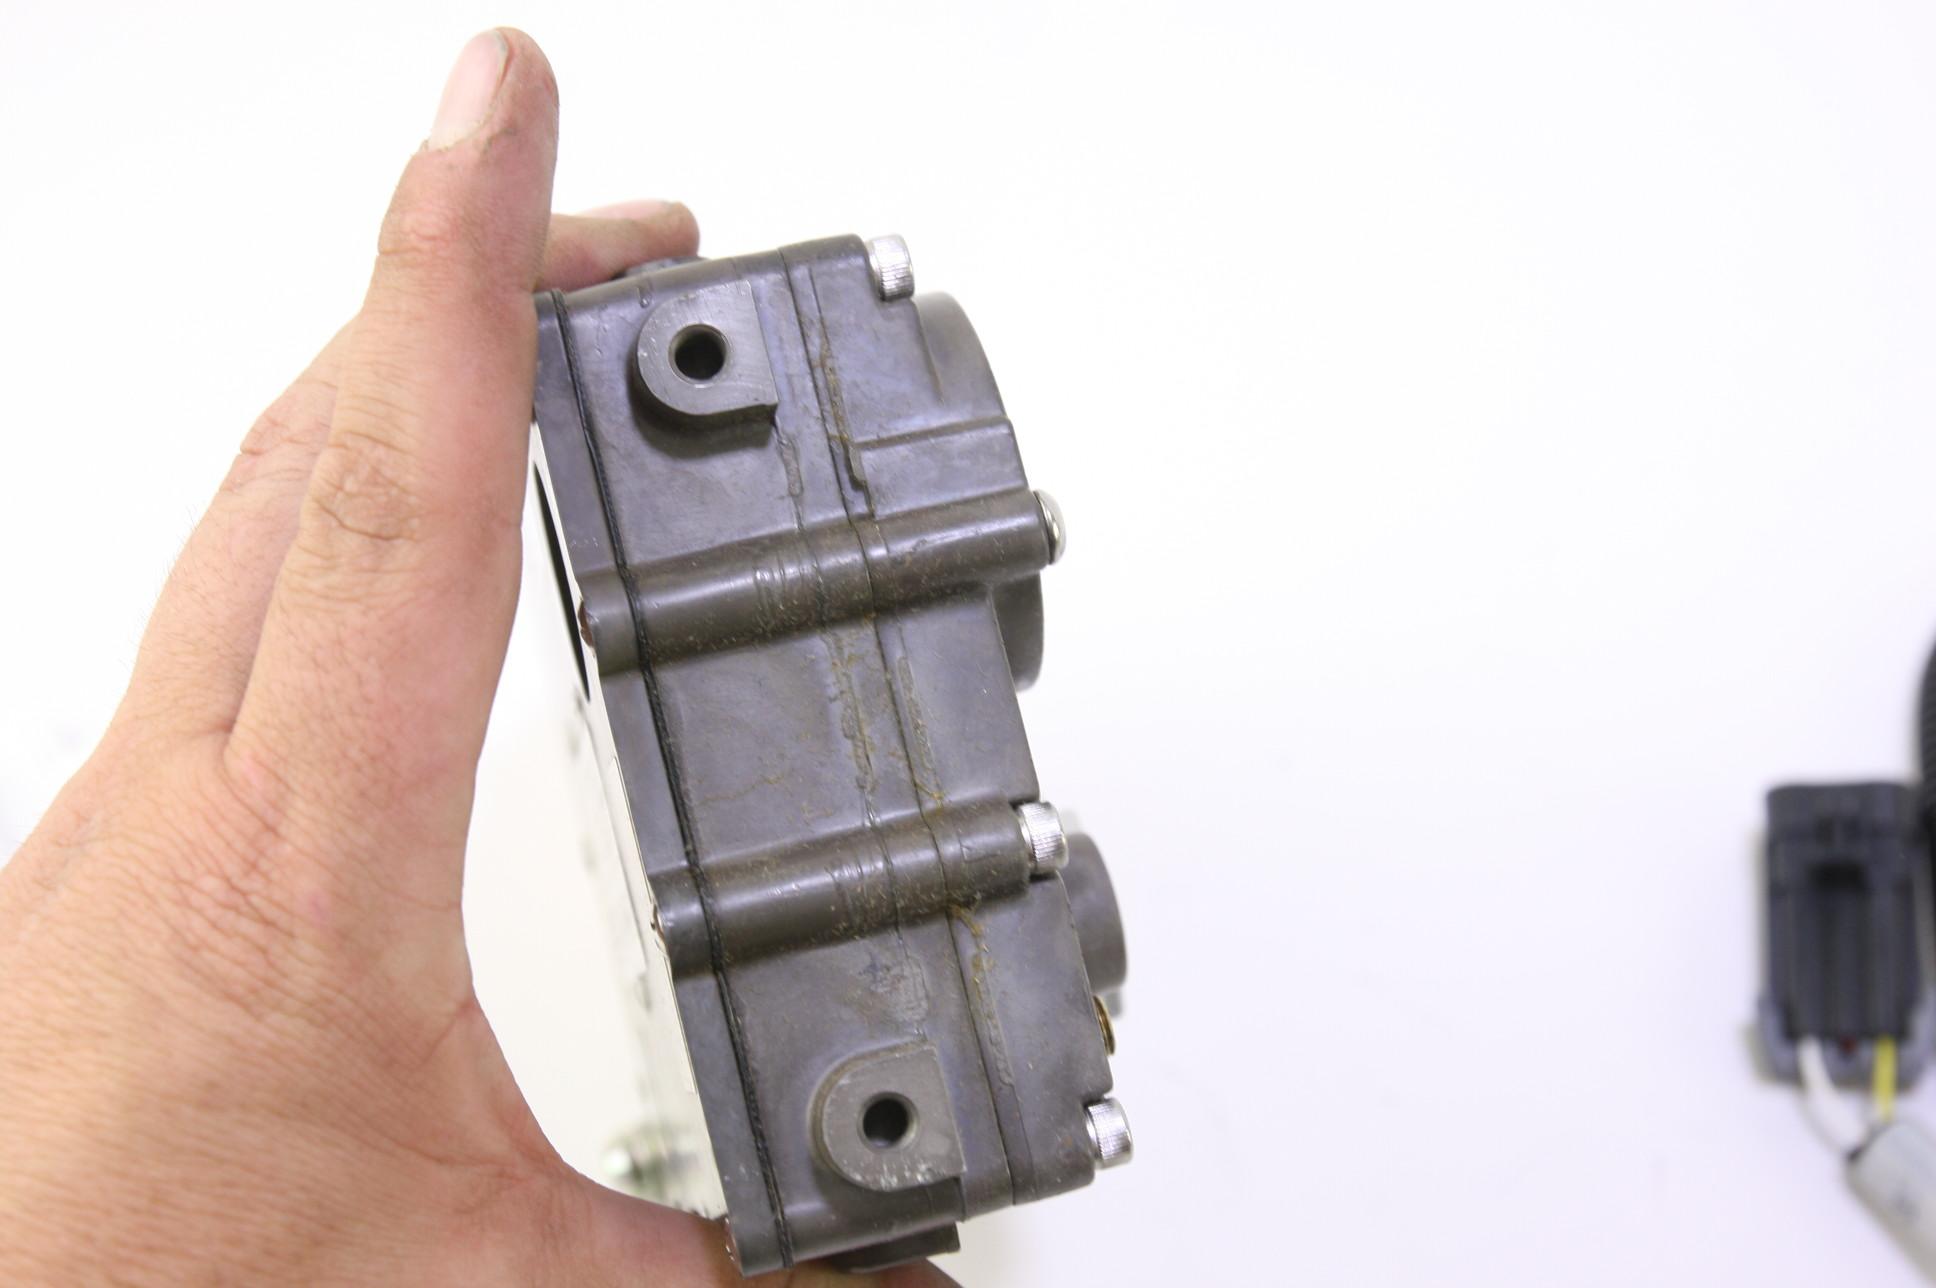 ~ New OEM 3L3Z9C968BB Ford Regulator - Fuel Pressure Free Shipping - image 6